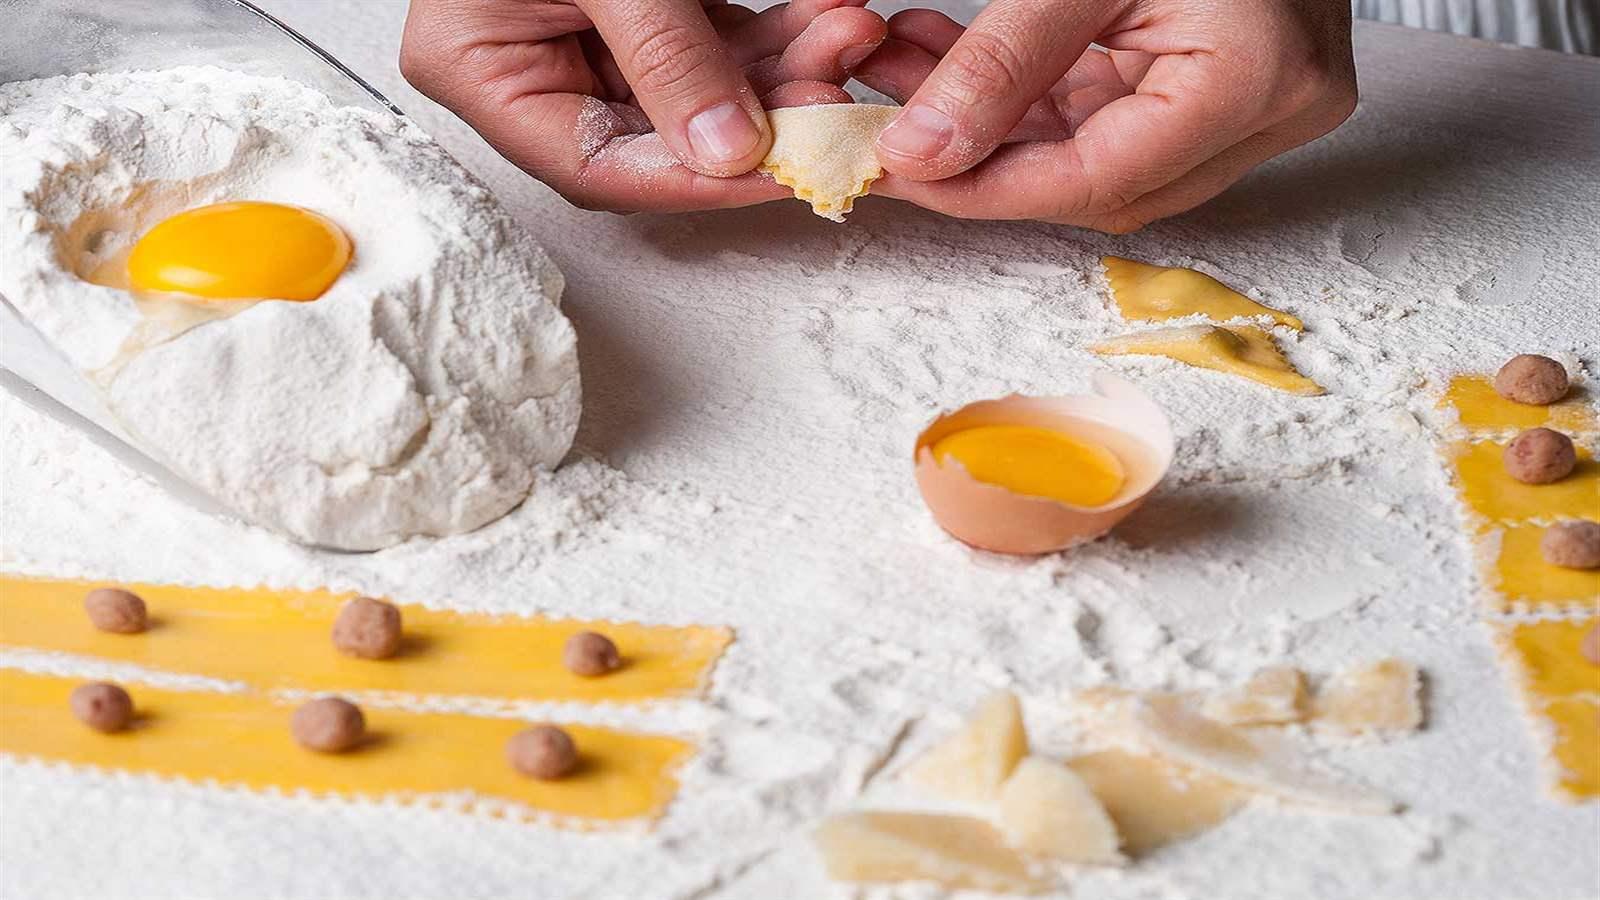 team building parma: corsi di cucina | food valley travel - Corsi Cucina Parma